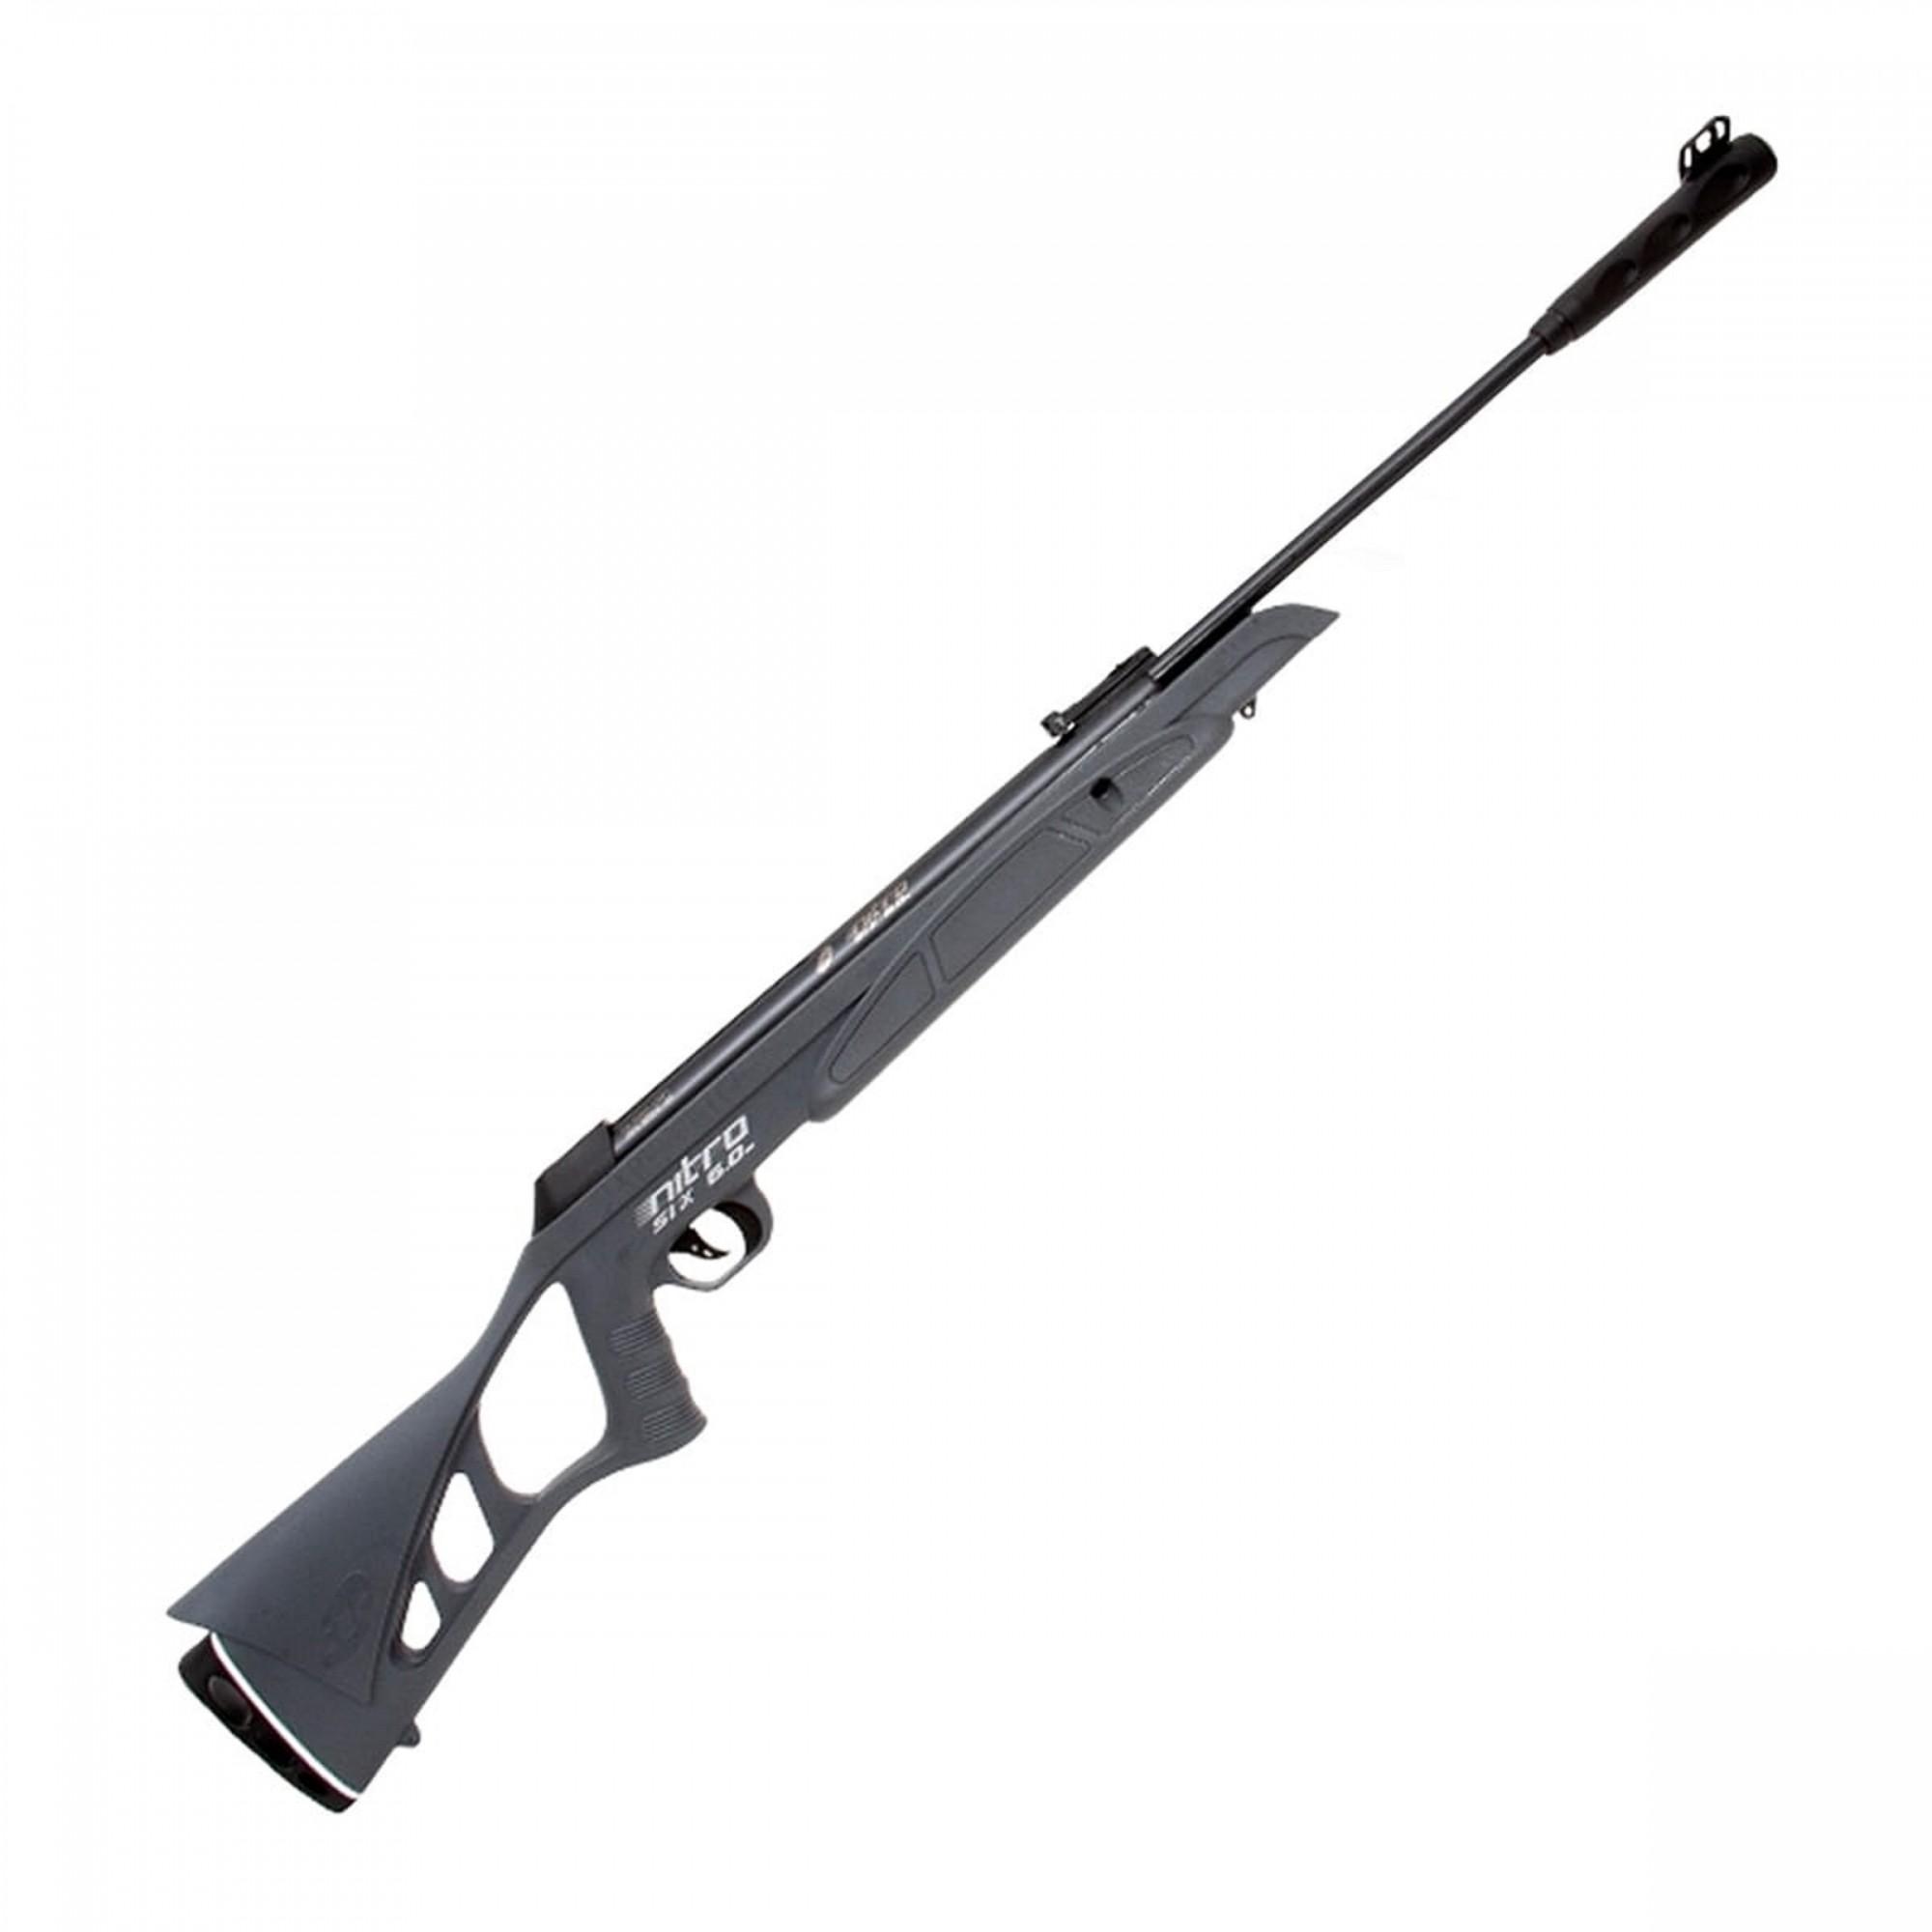 Carabina de Pressão CBC 6mm Nitro-Six Oxidada Cinza